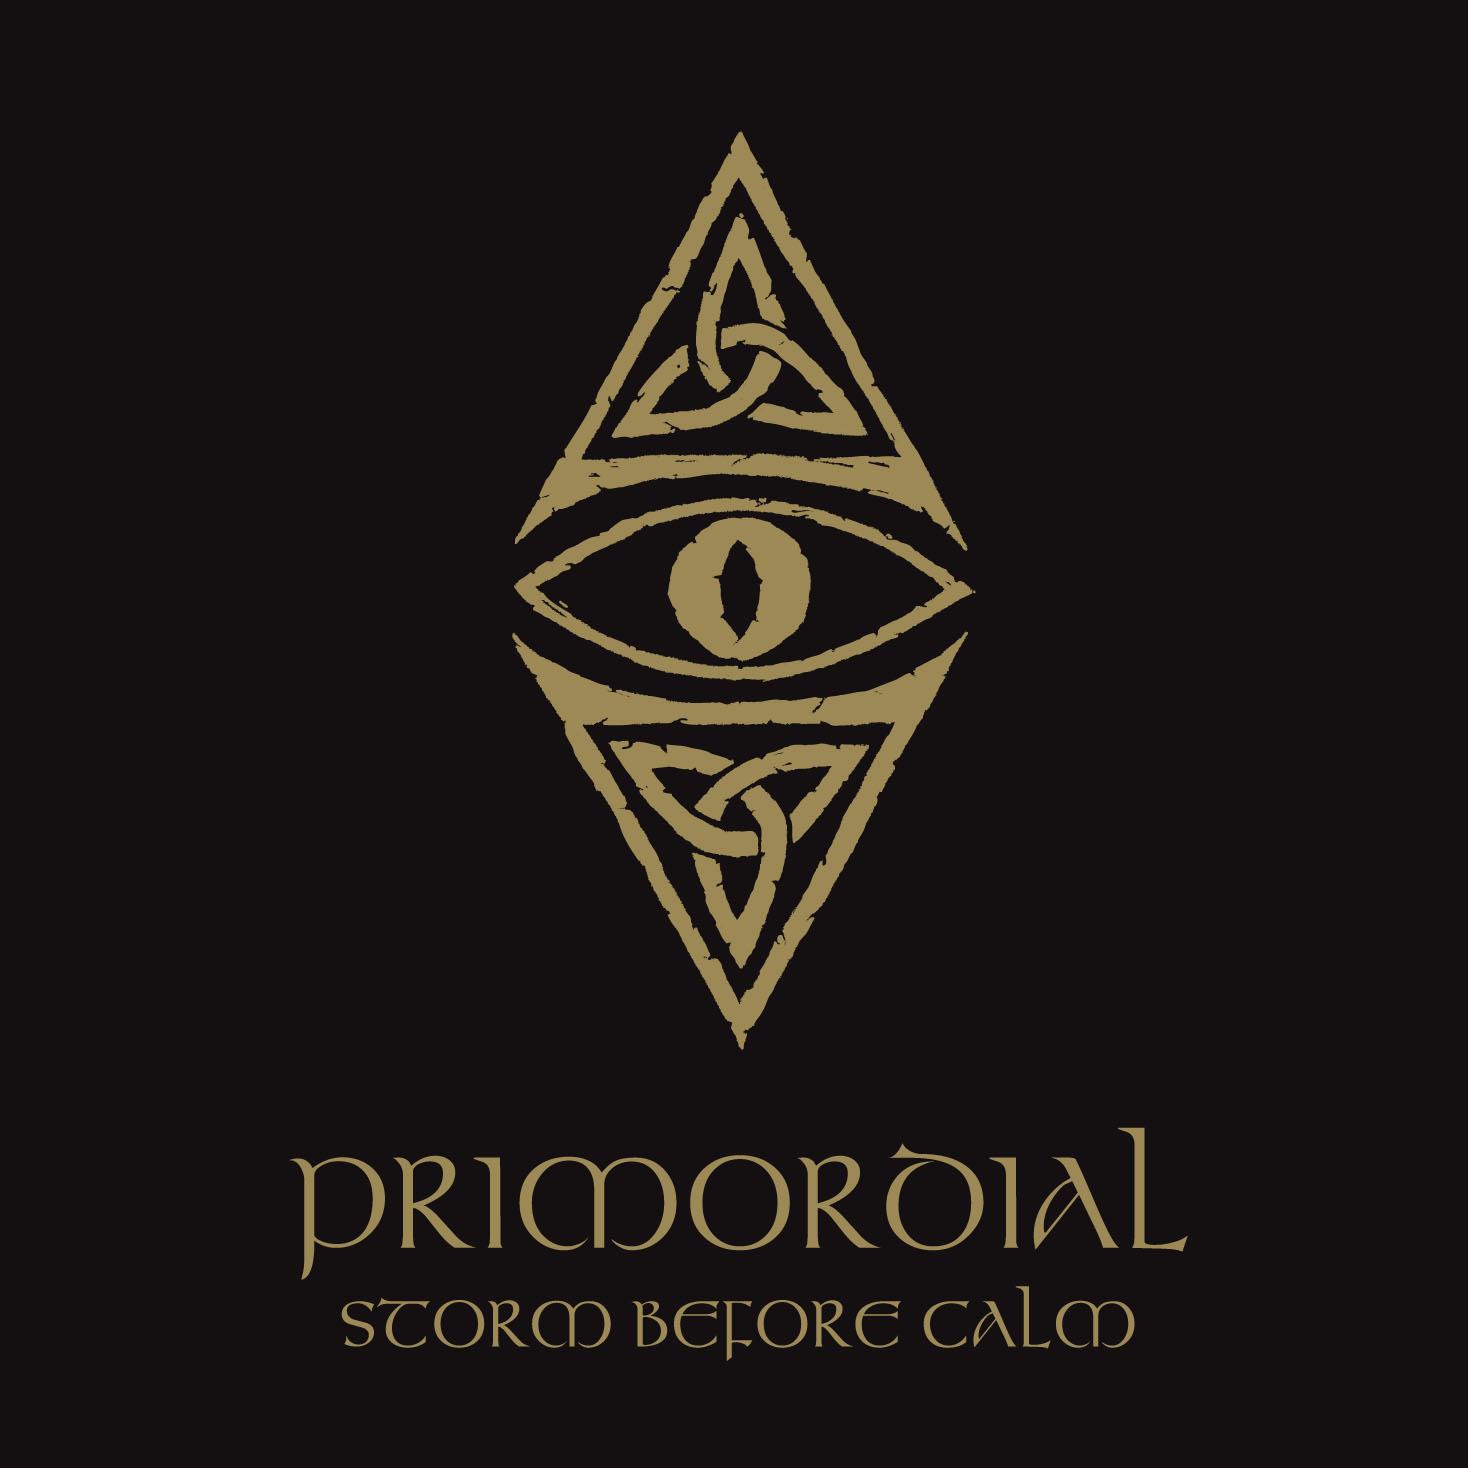 Primordial - Storm Before Calm-300dpi.jpg